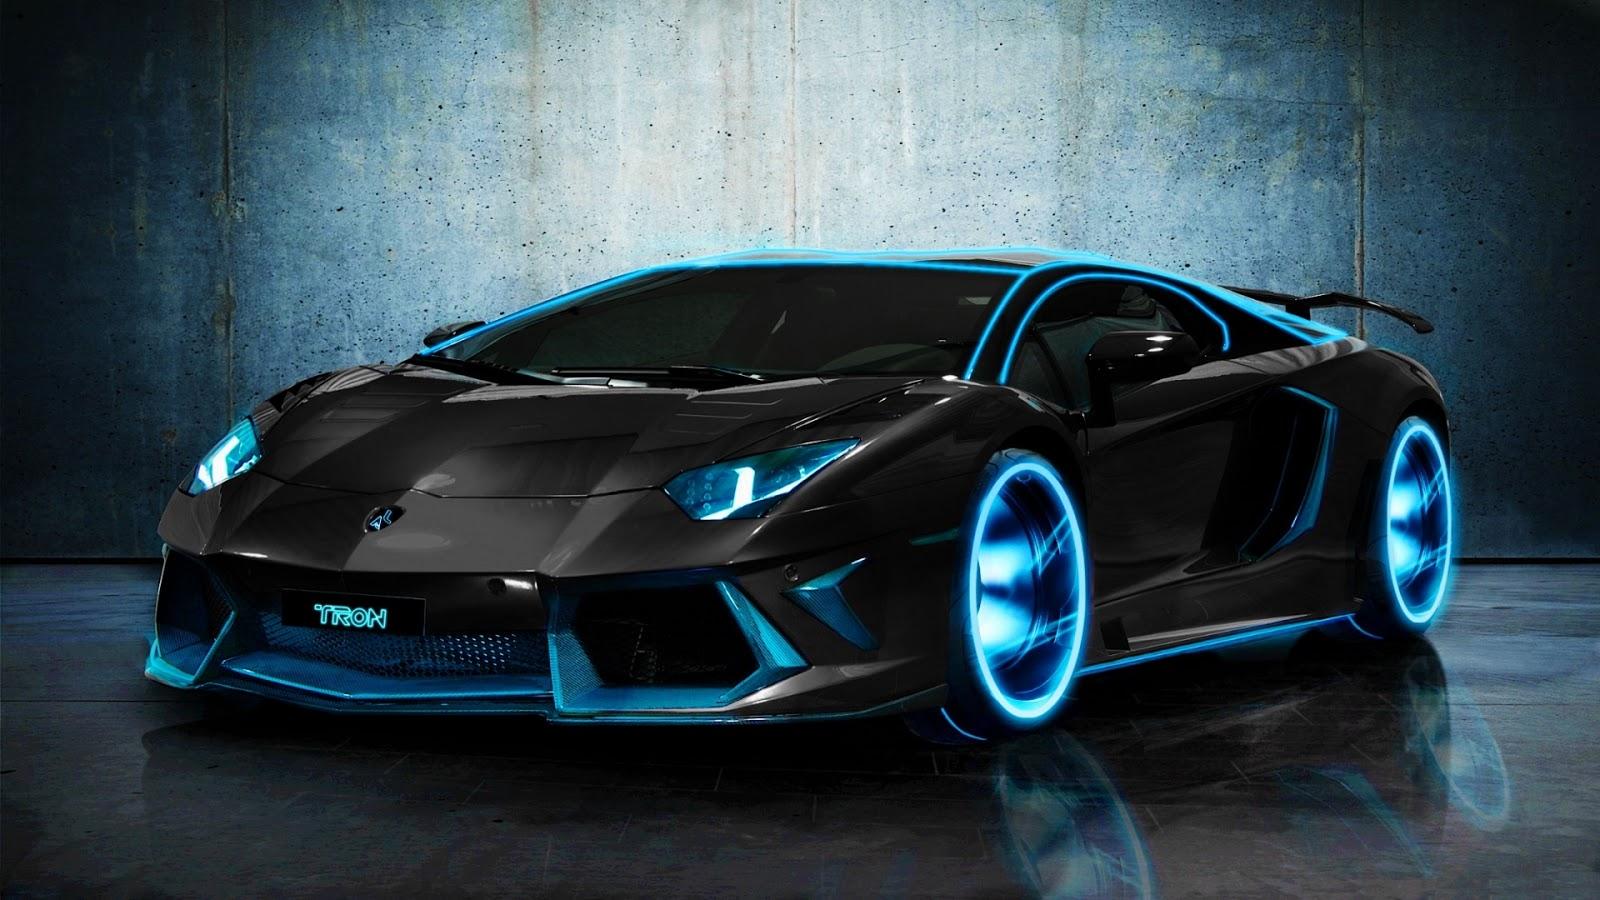 Tron Lamborghini Aventador HD Wallpaper